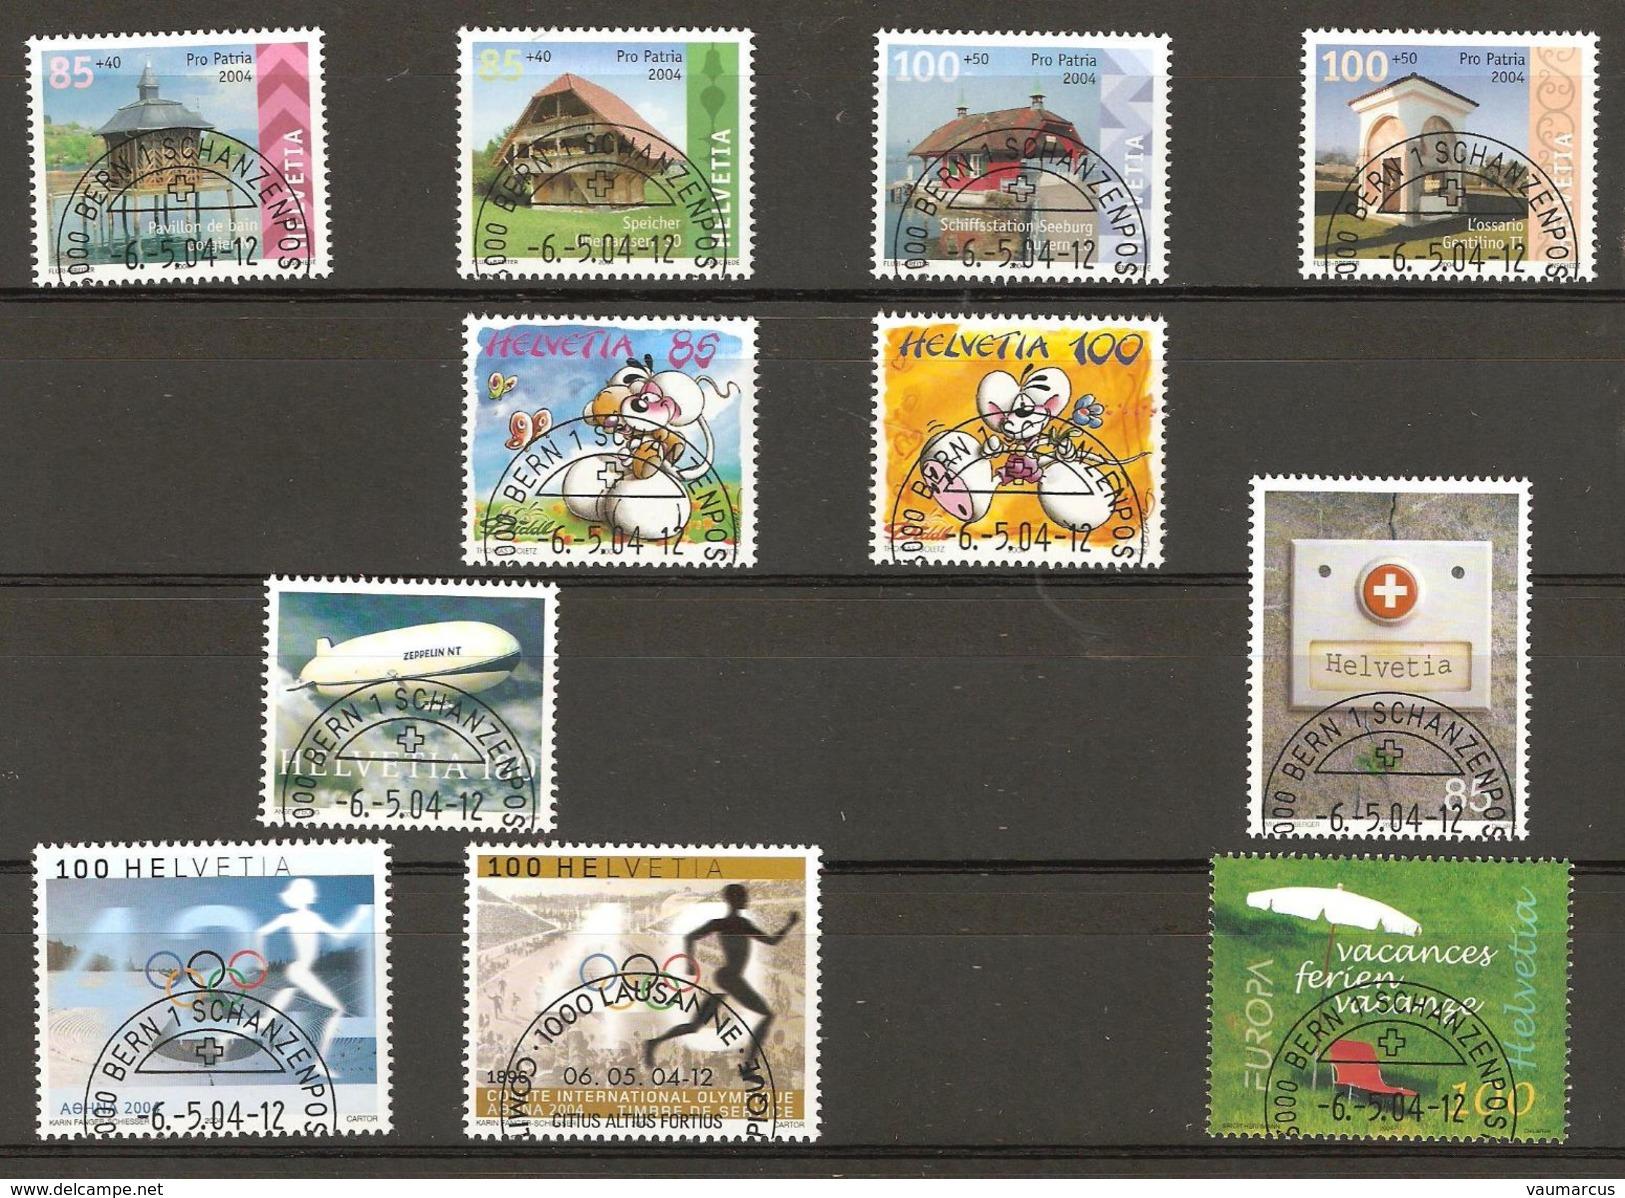 2004 Année Complète Obl. Demi-lune 1er Jour BERN 1 SCHANZENPOST SBK 140,90 Voir 5 Scans - Switzerland